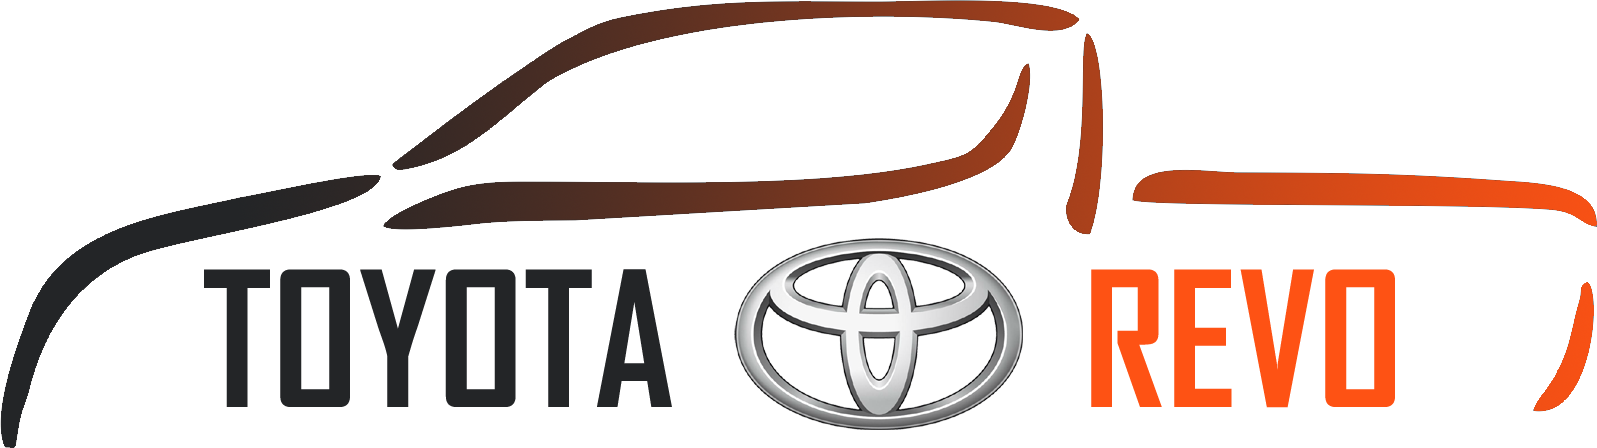 Trust motors Thailand  -Toyota Revo 2020-2021 Rocco-Ford Raptor 2020 4×4 Diesel Pickups Exporter